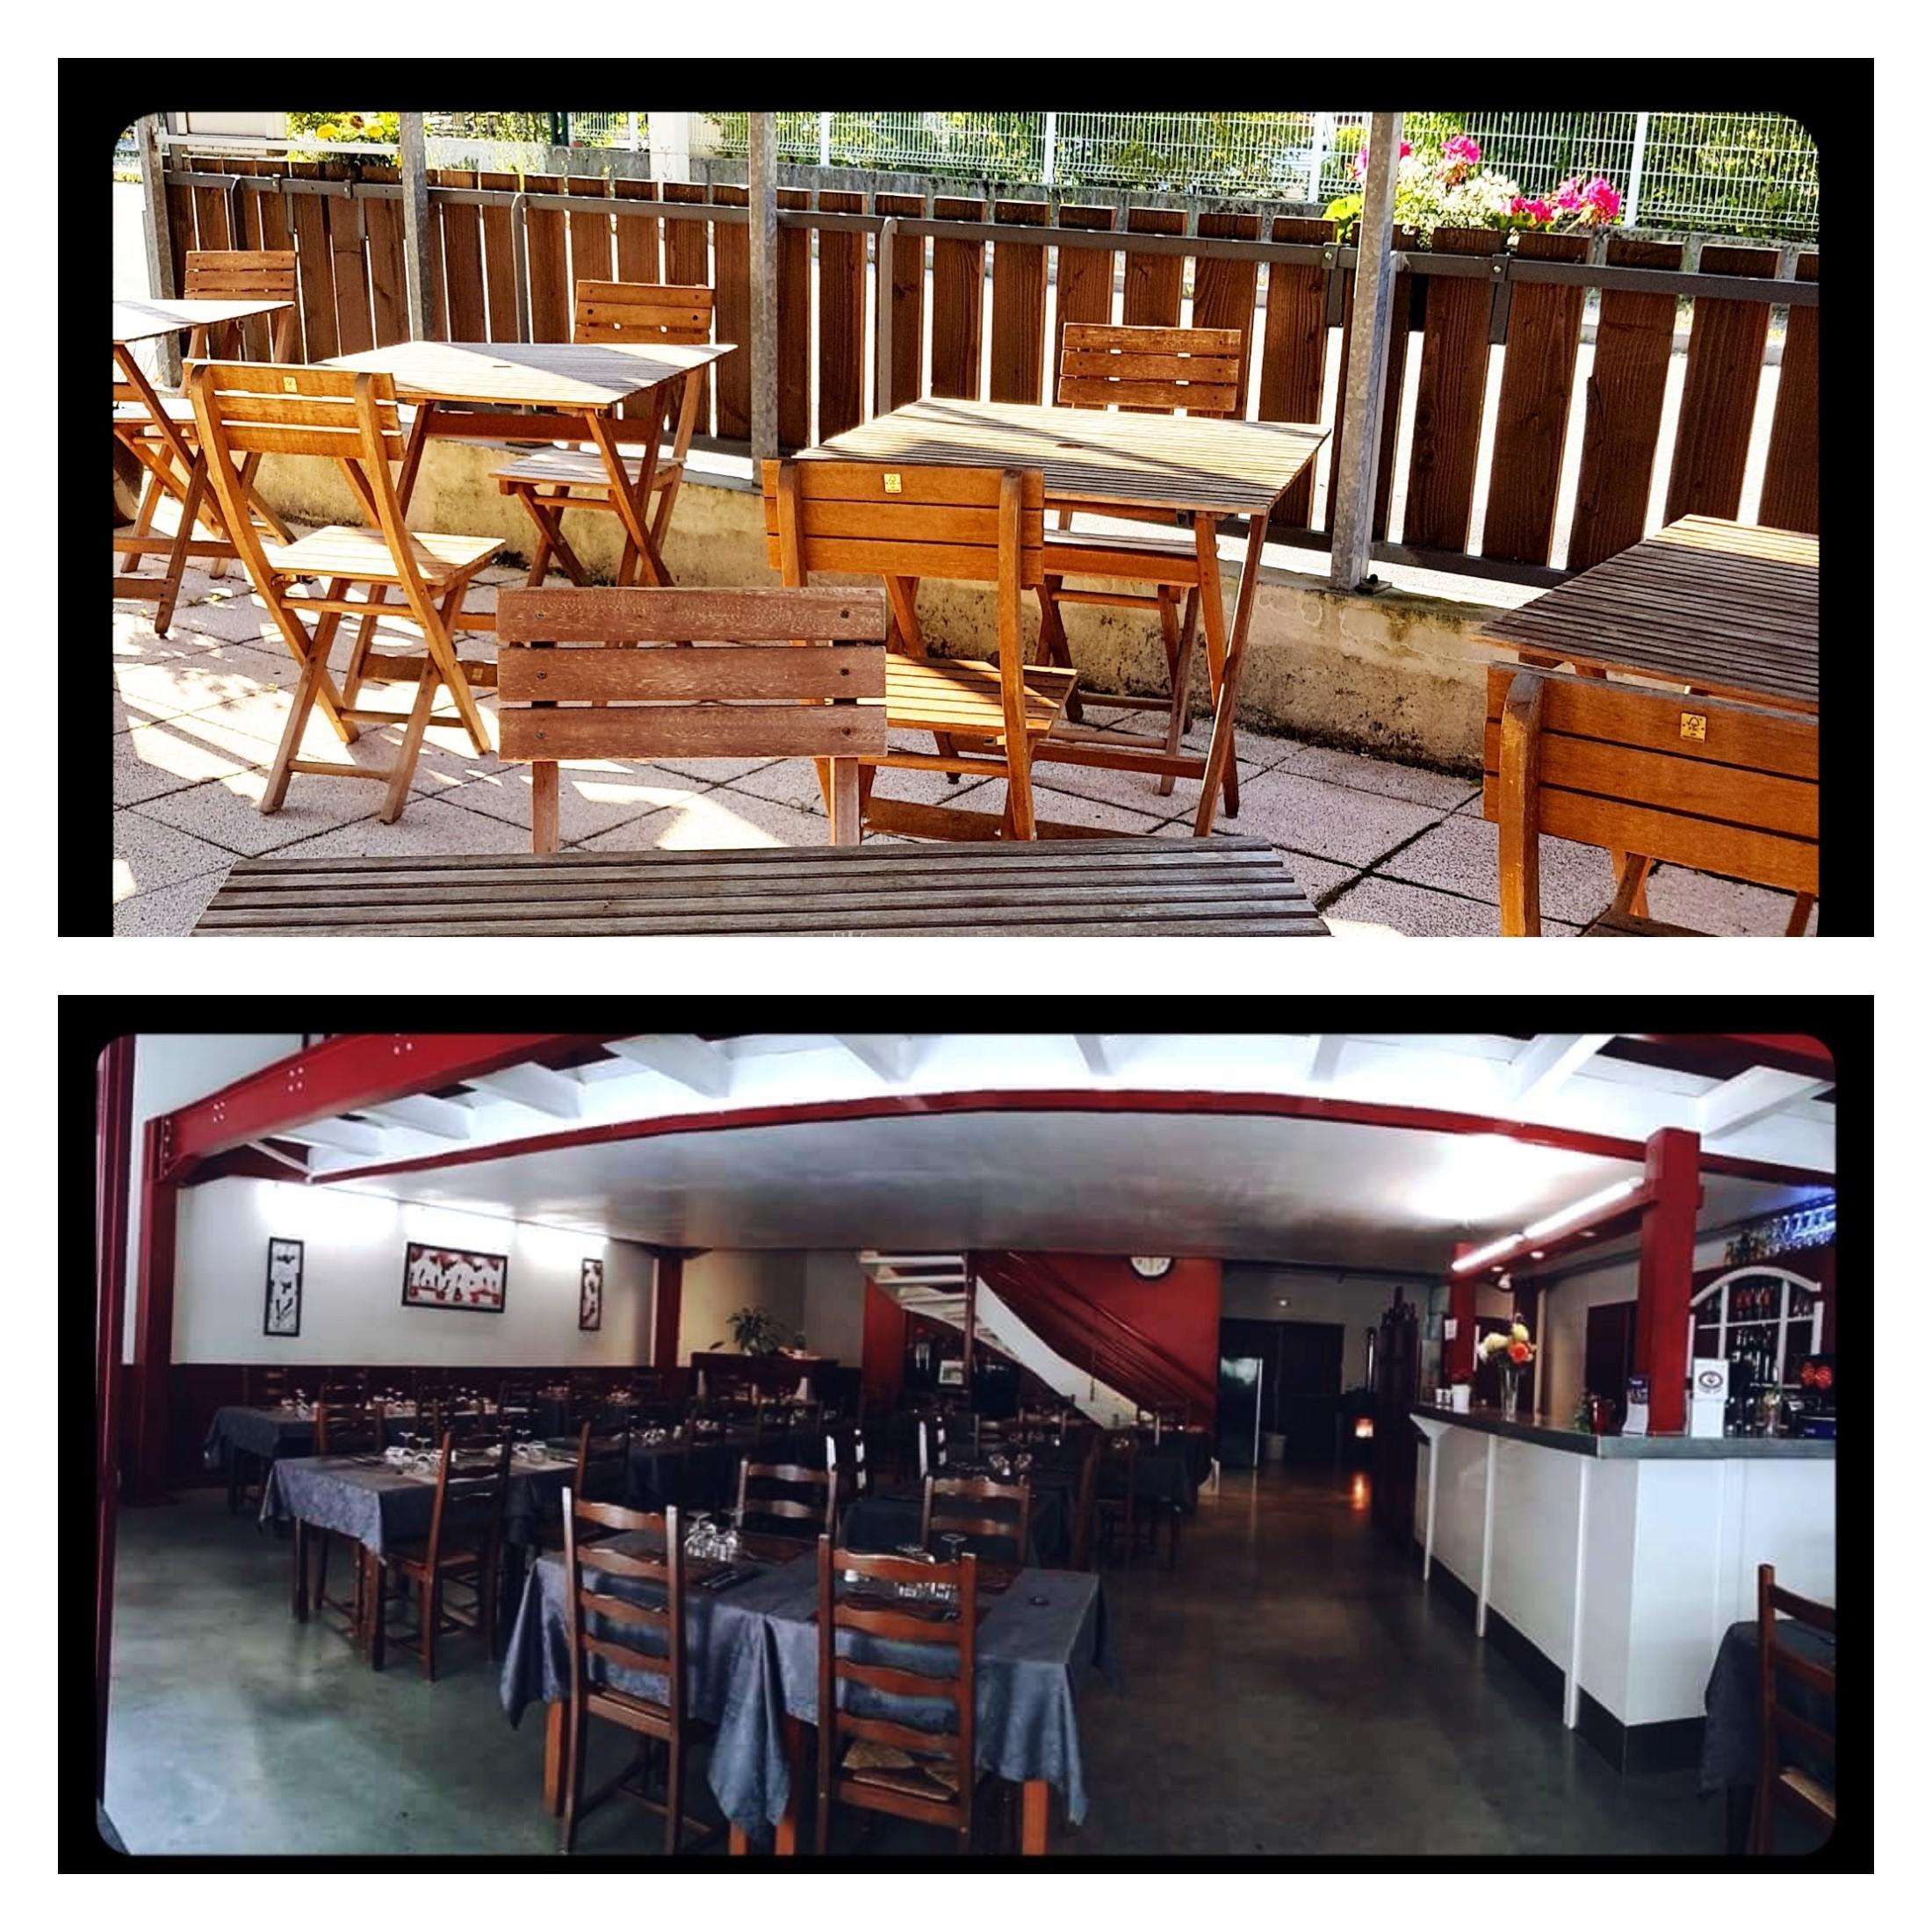 Bienvenue au restaurant Chez caro-line !